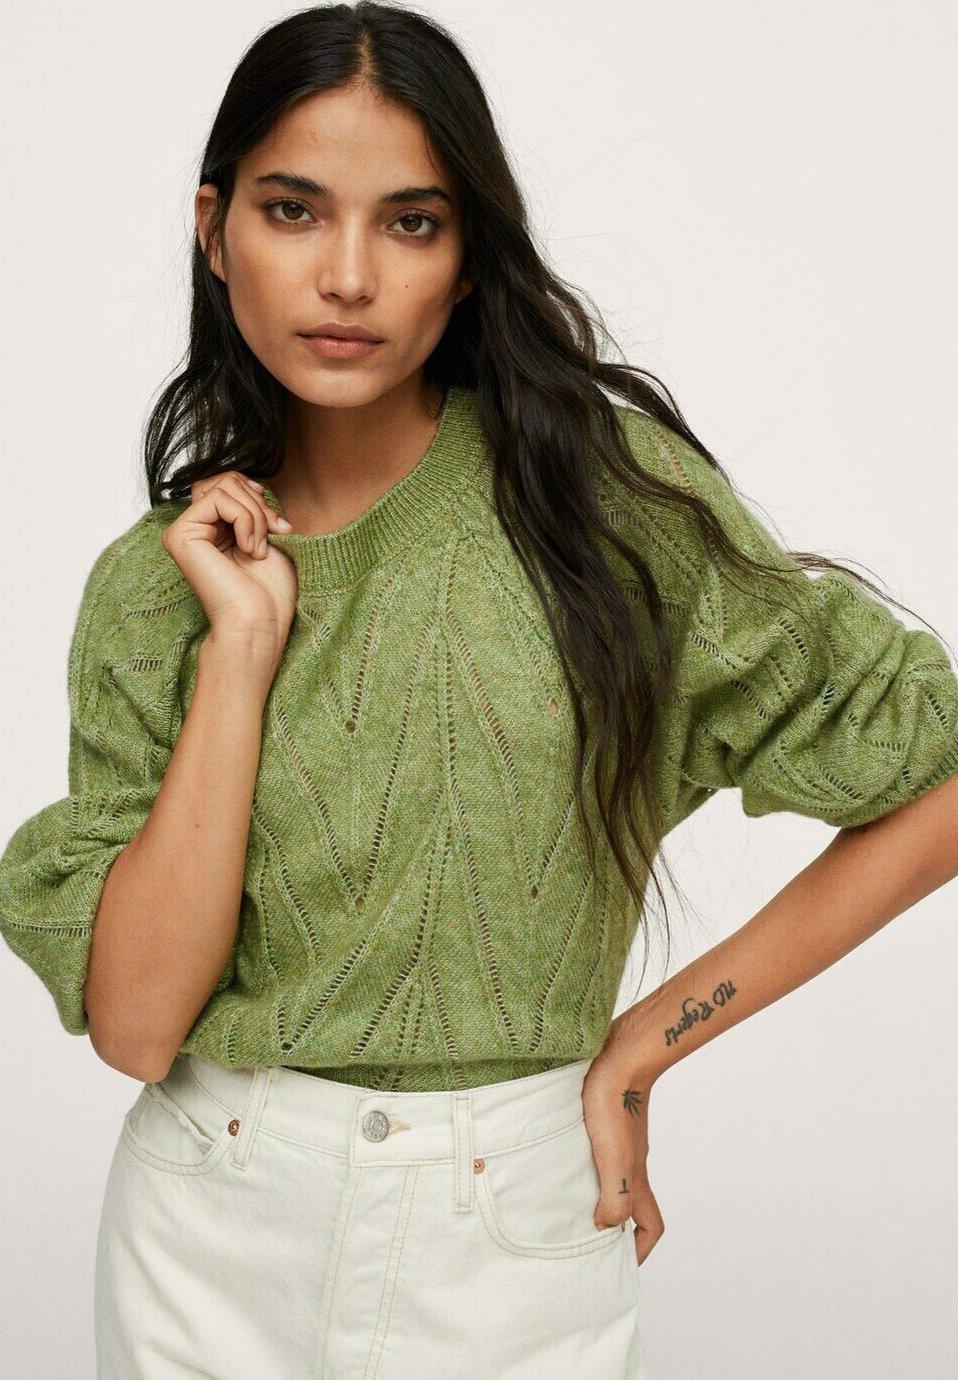 Femme VISGRAAT - Pullover